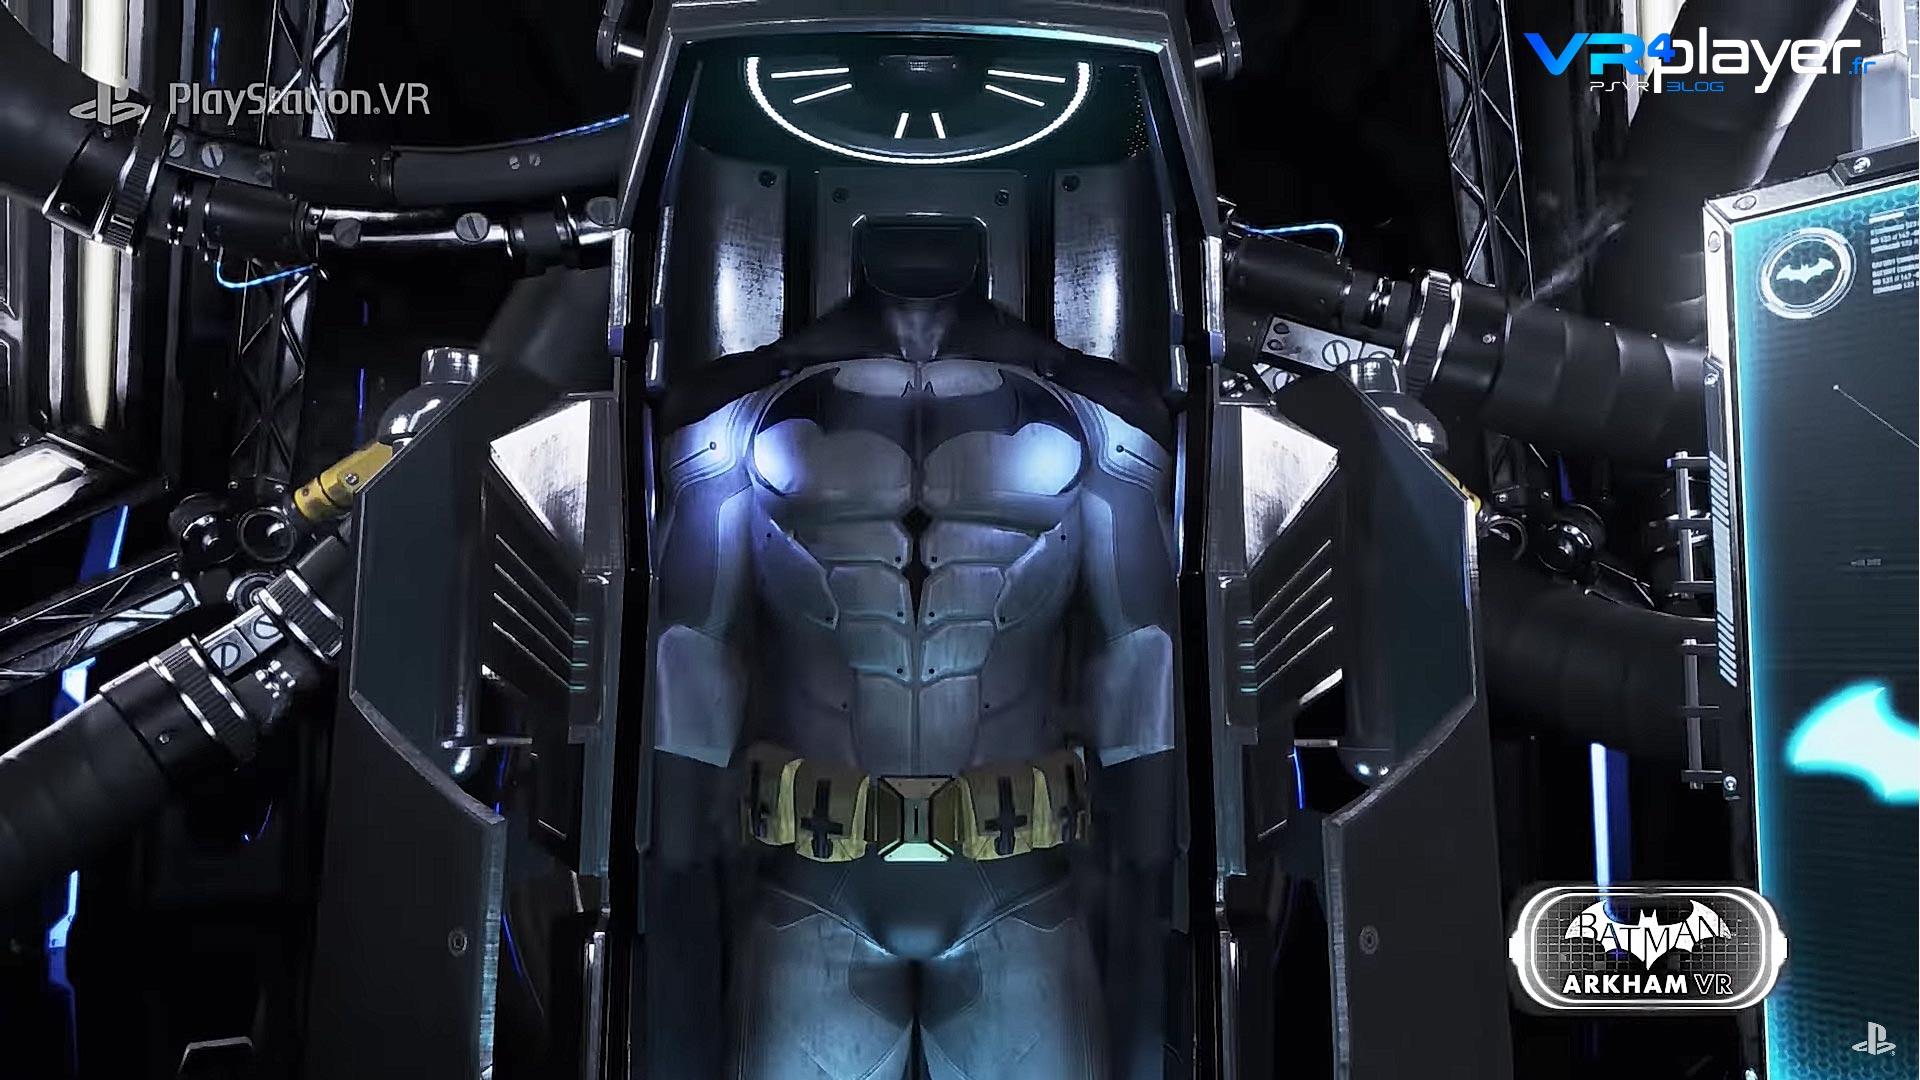 Batman Arkham VR PSVR - VR4Player